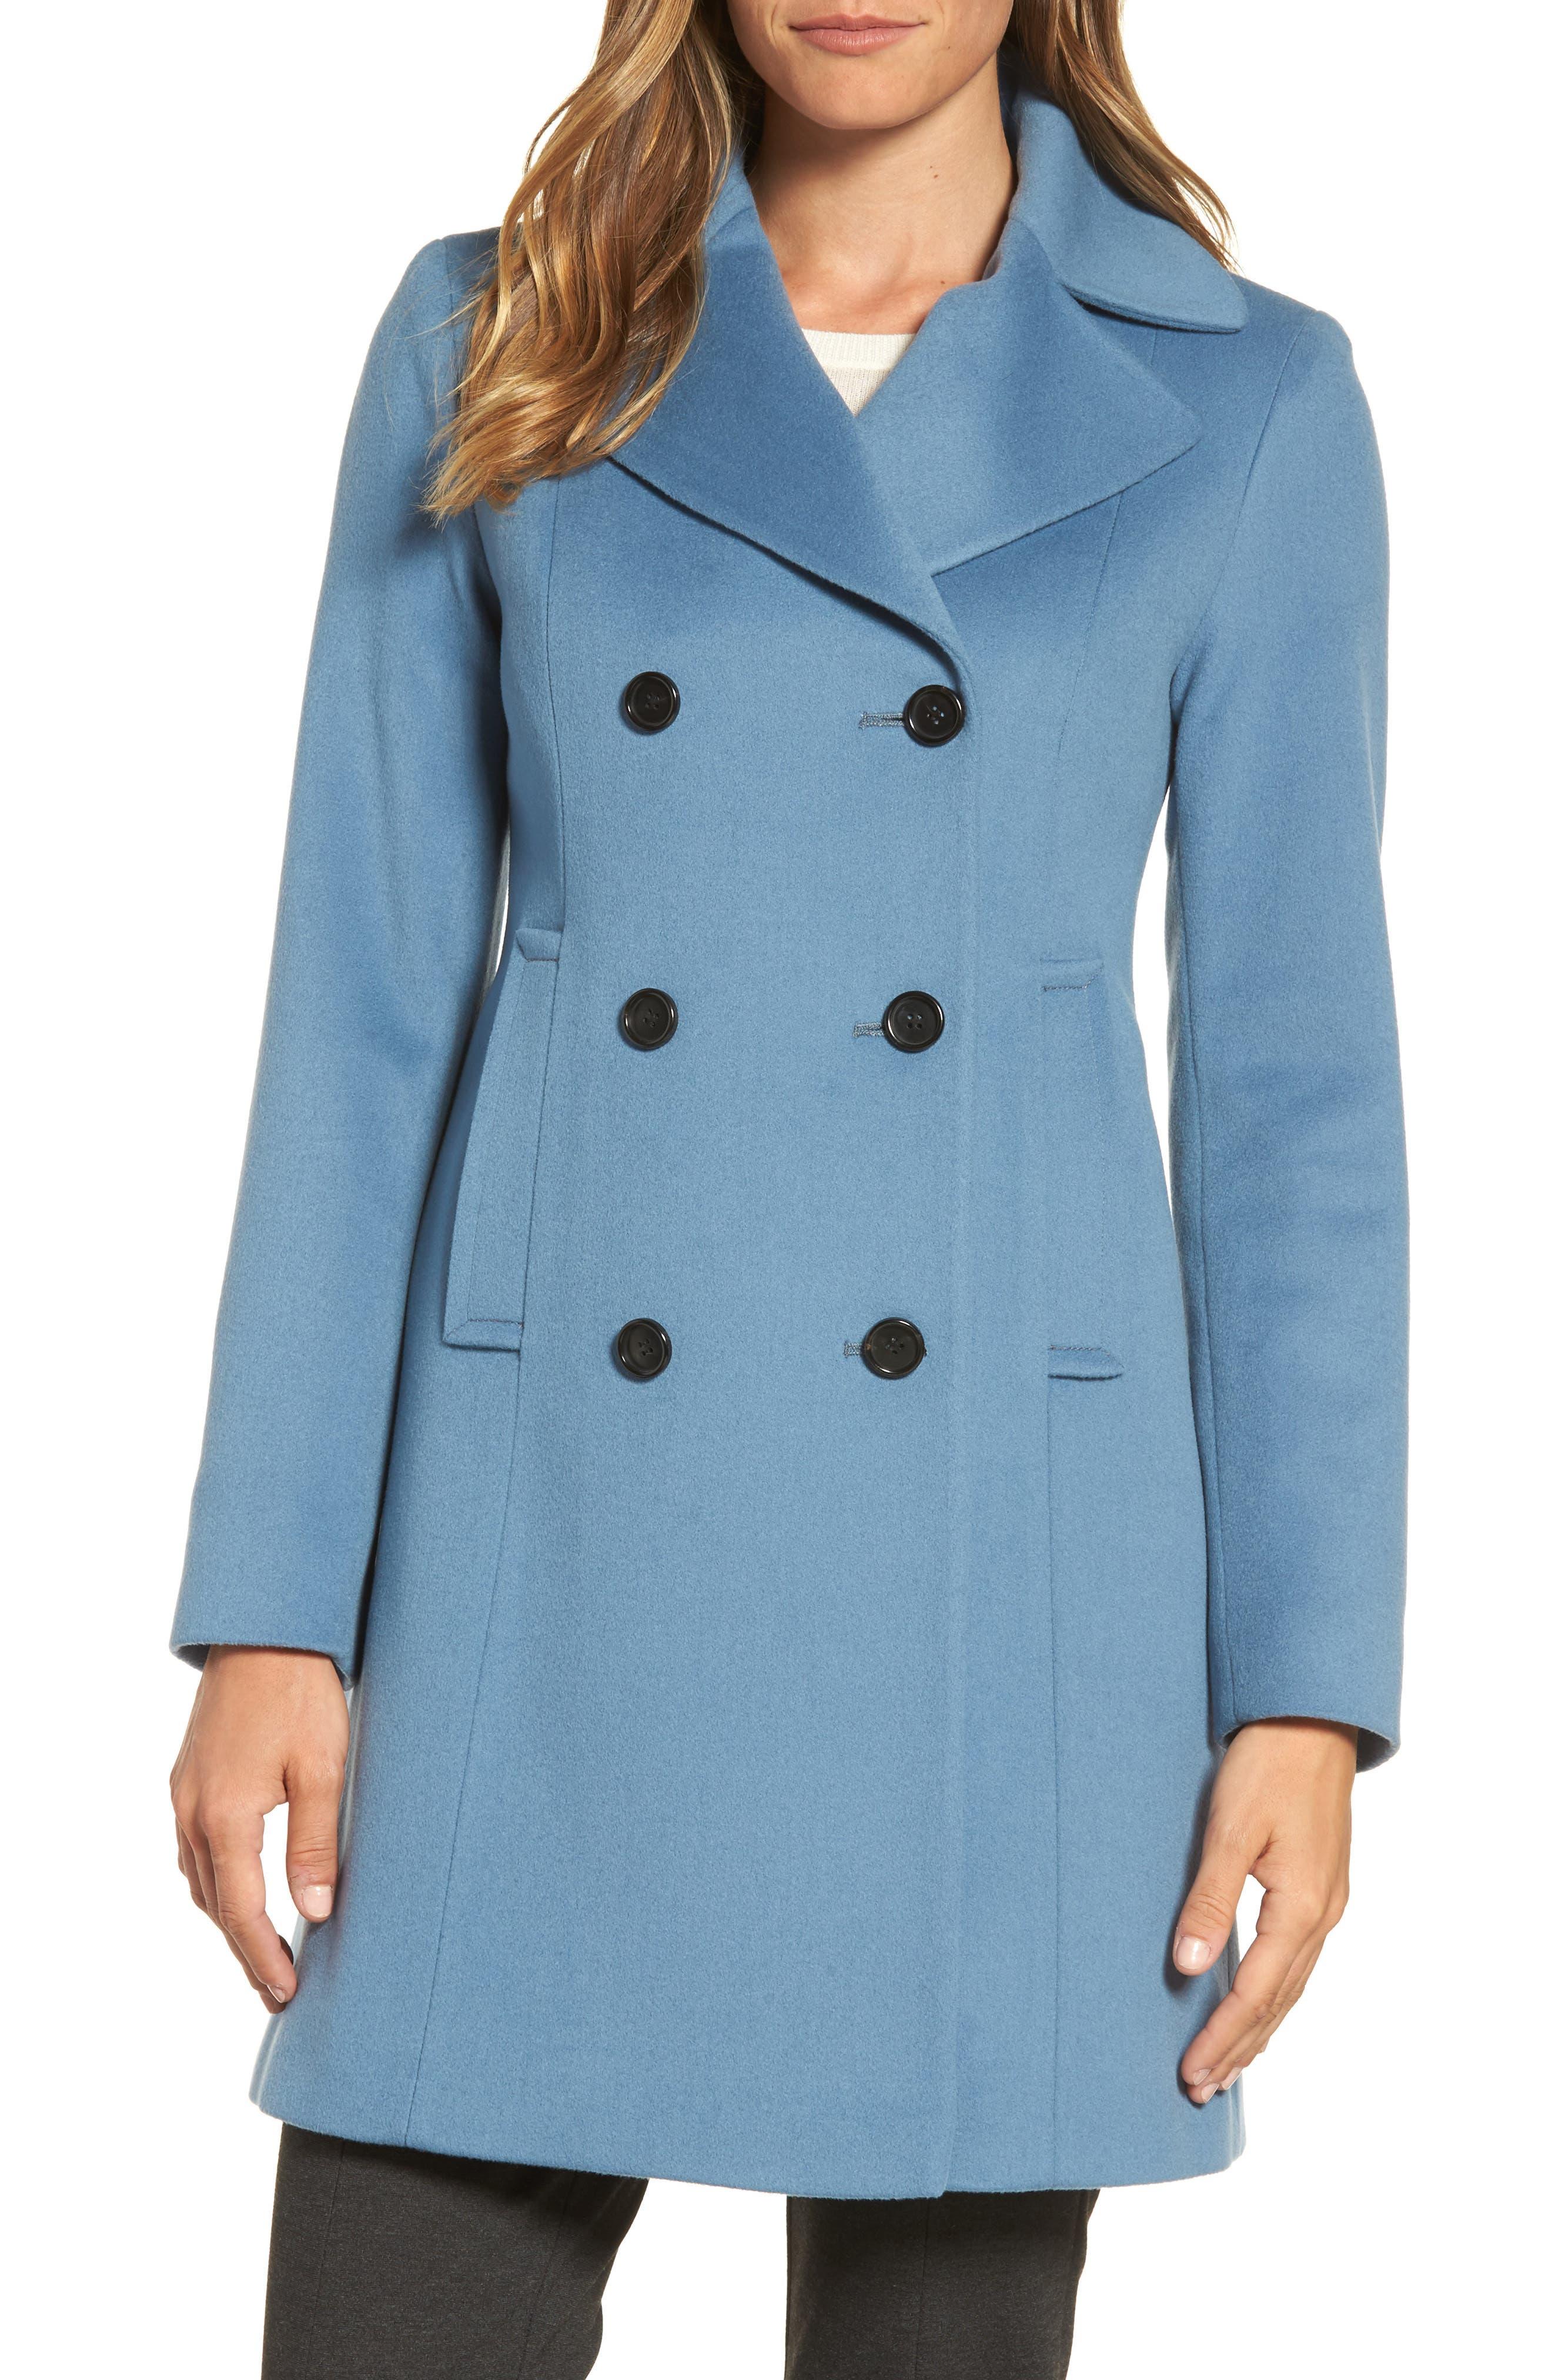 Main Image - Fleurette Double Breasted Loro Piana Wool Coat (Regular & Petite)